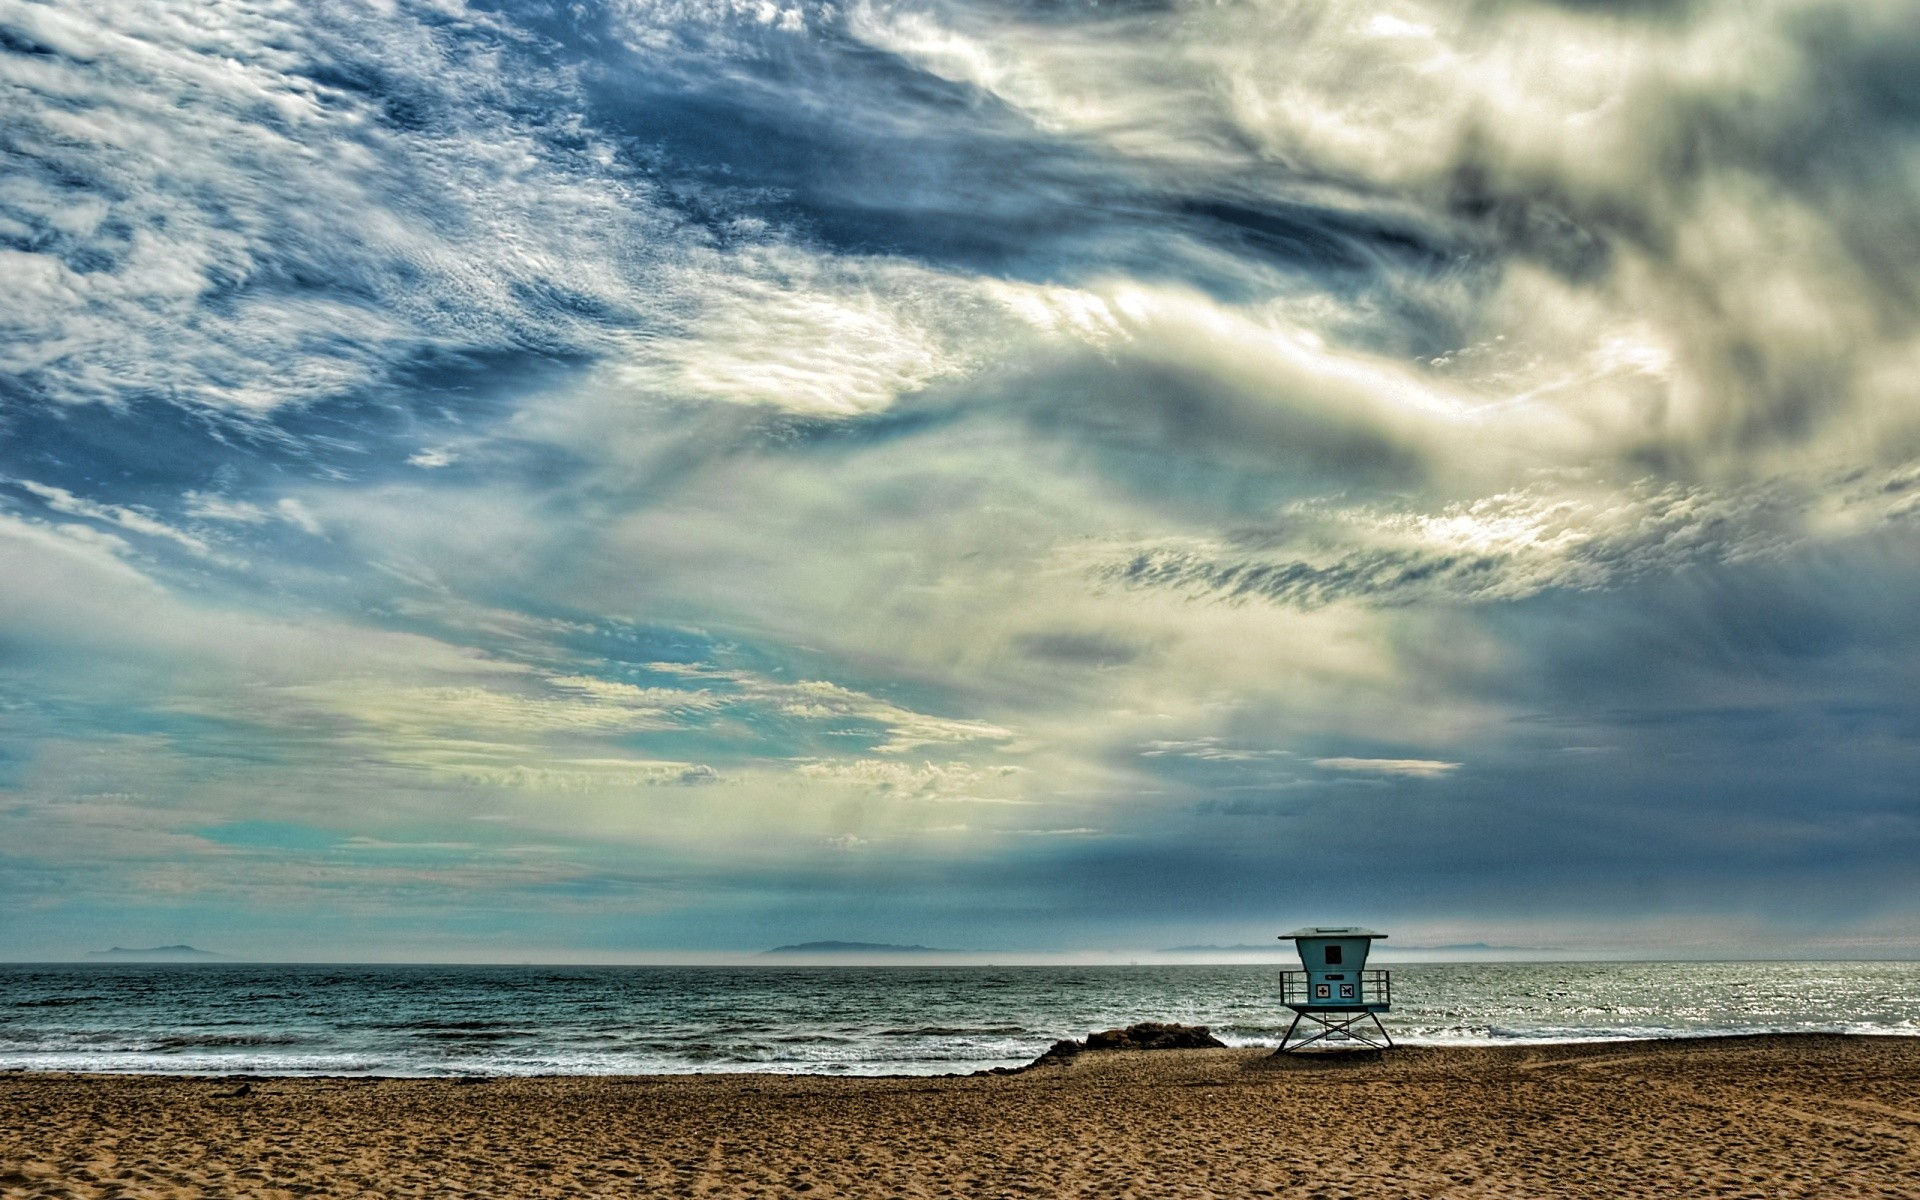 Sea And Ocean Water Sea Storm Ocean Beach Sky Sunset - Morning Beach - HD Wallpaper